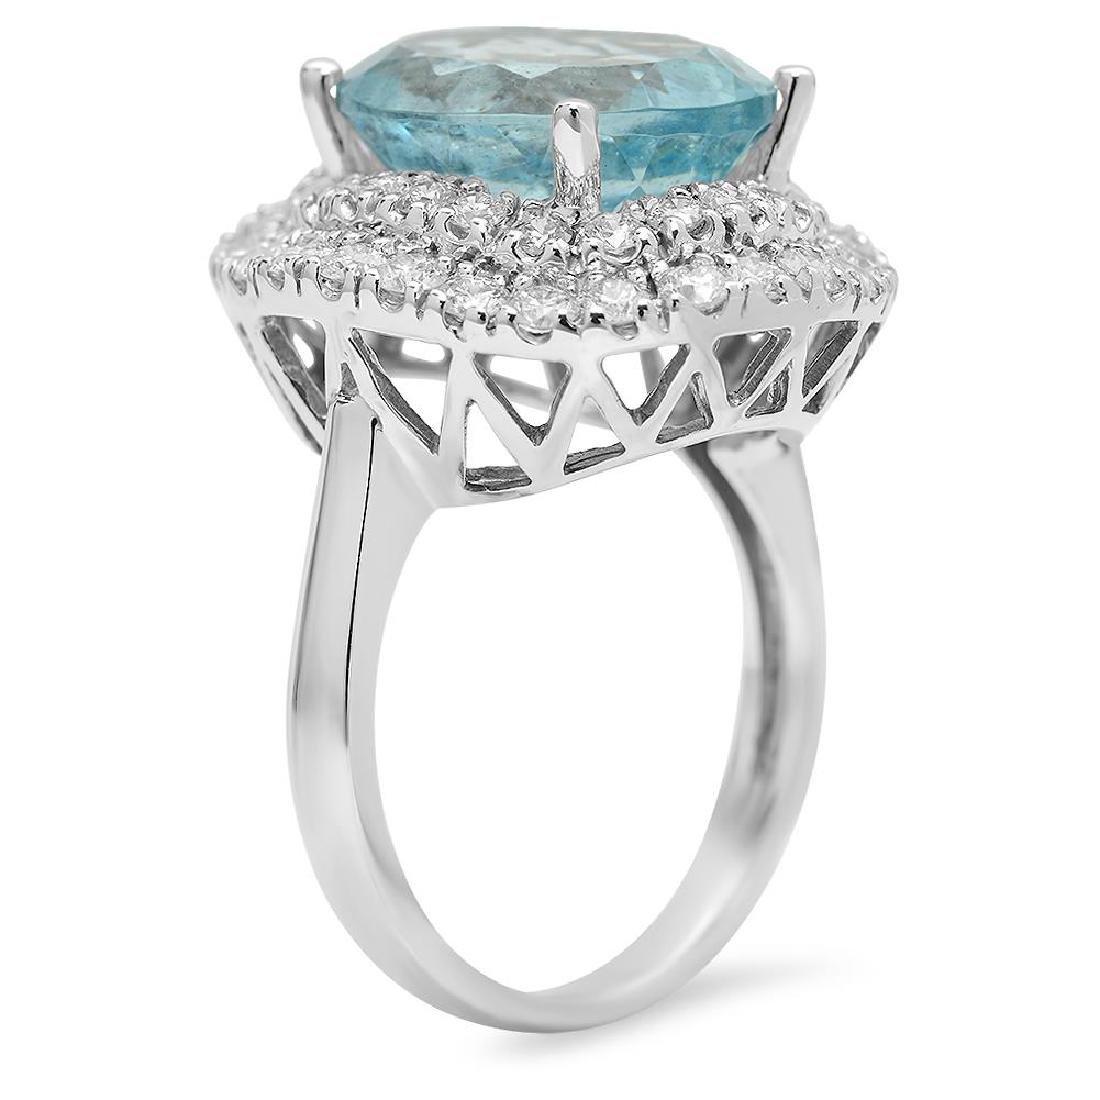 14K Gold 6.88ct Aquamarine 1.65ct Diamond Ring - 2